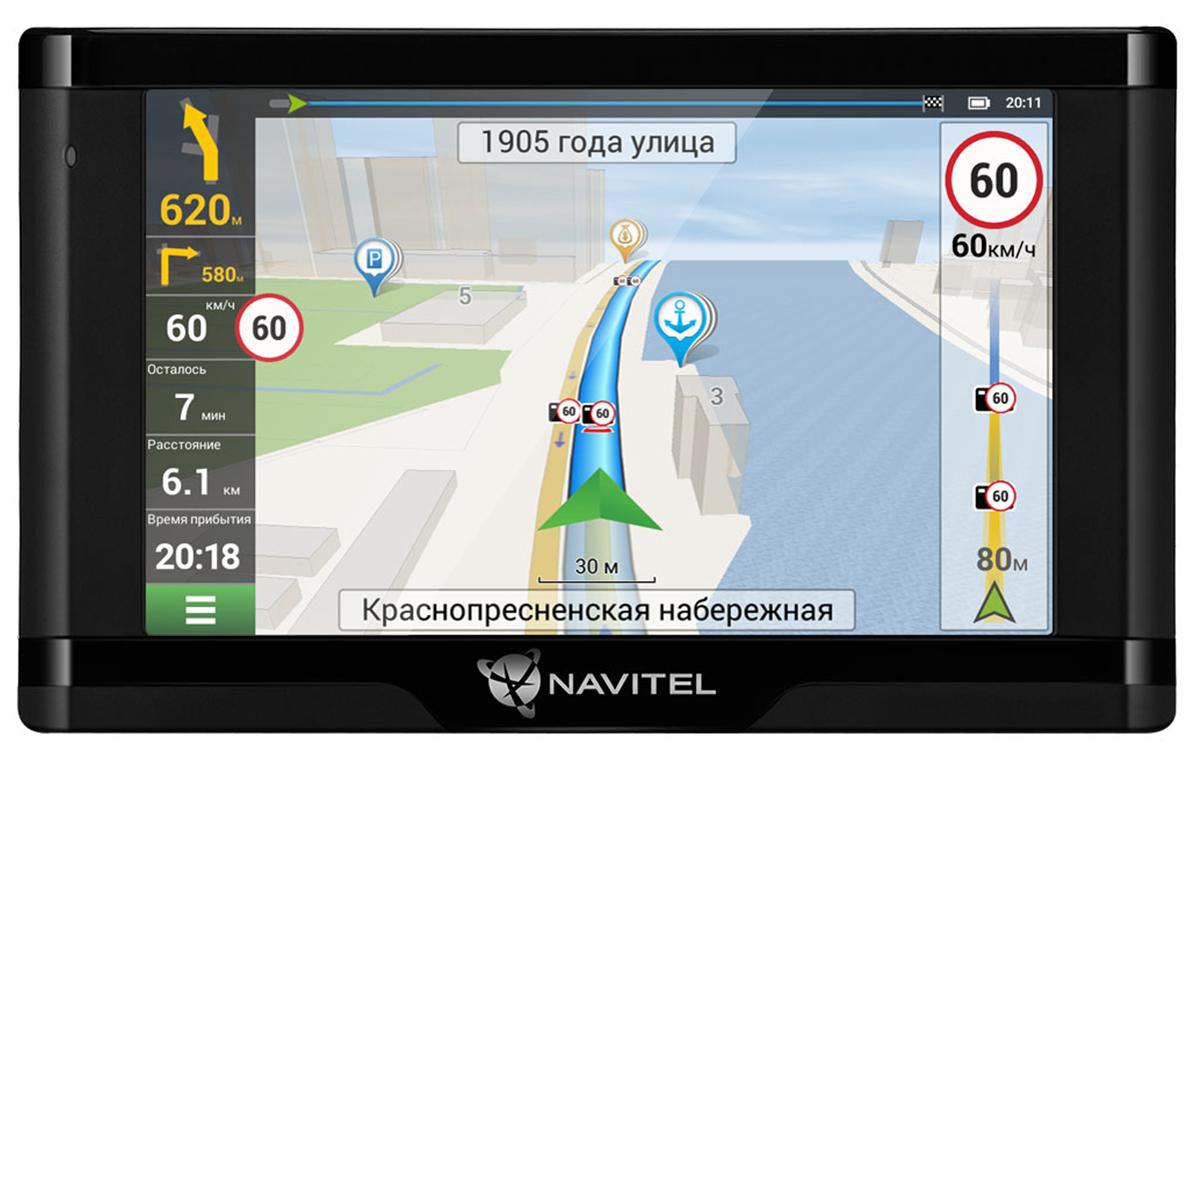 Спутниковый GPS навигатор Navitel E500 Magnetic